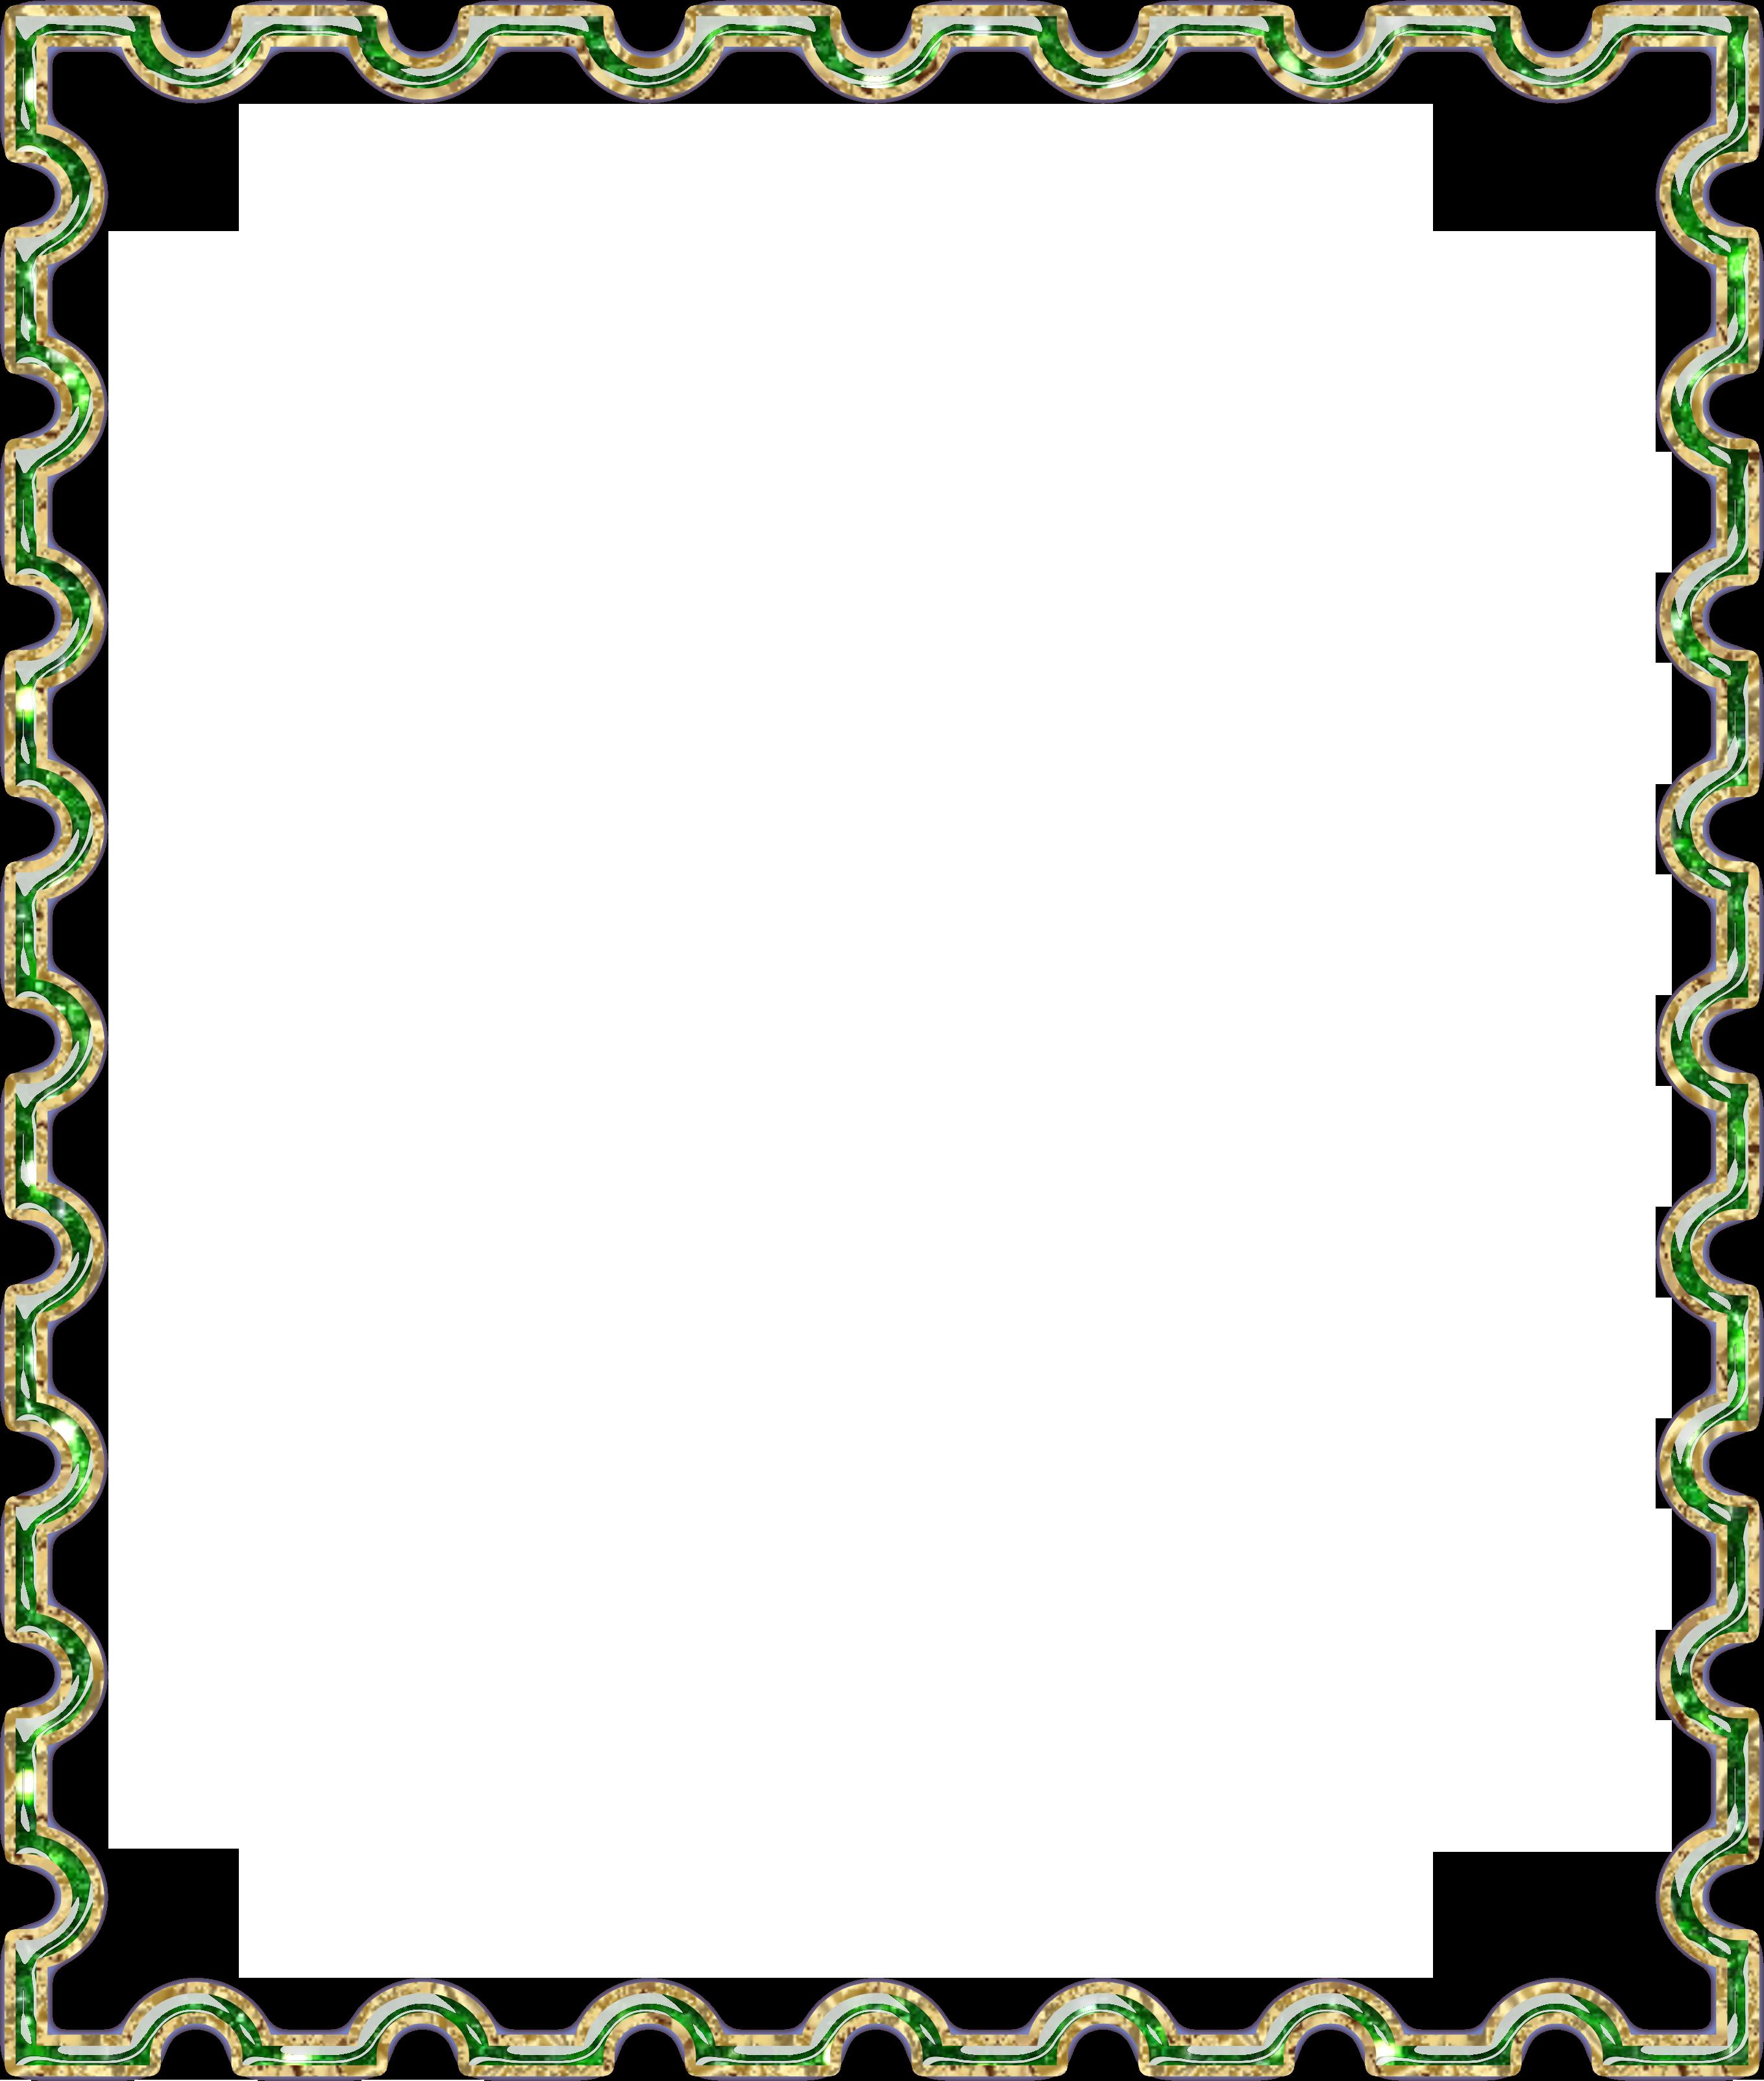 Картинка зеленая рамка